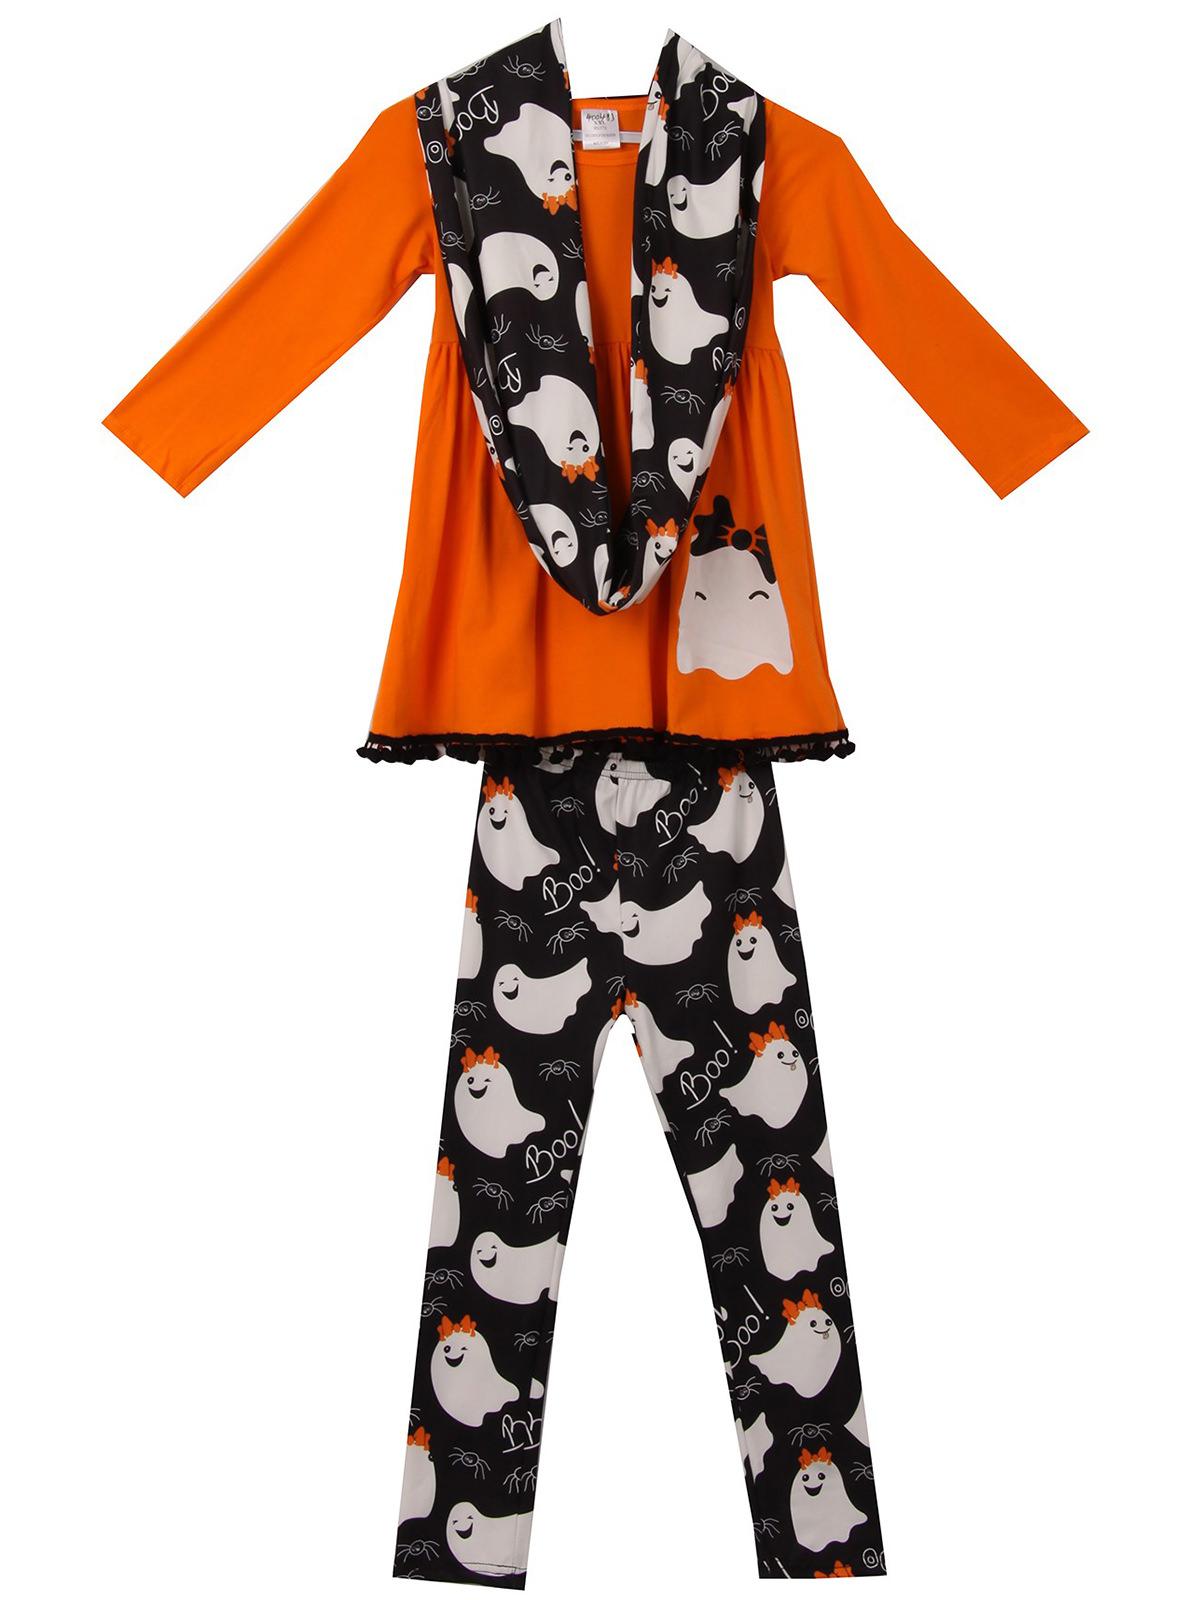 Toddler Girls 3 Pieces Set Halloween Outfit Long Sleeve Top Pants Scarf ClothingOrange 2T XS (P400483P)